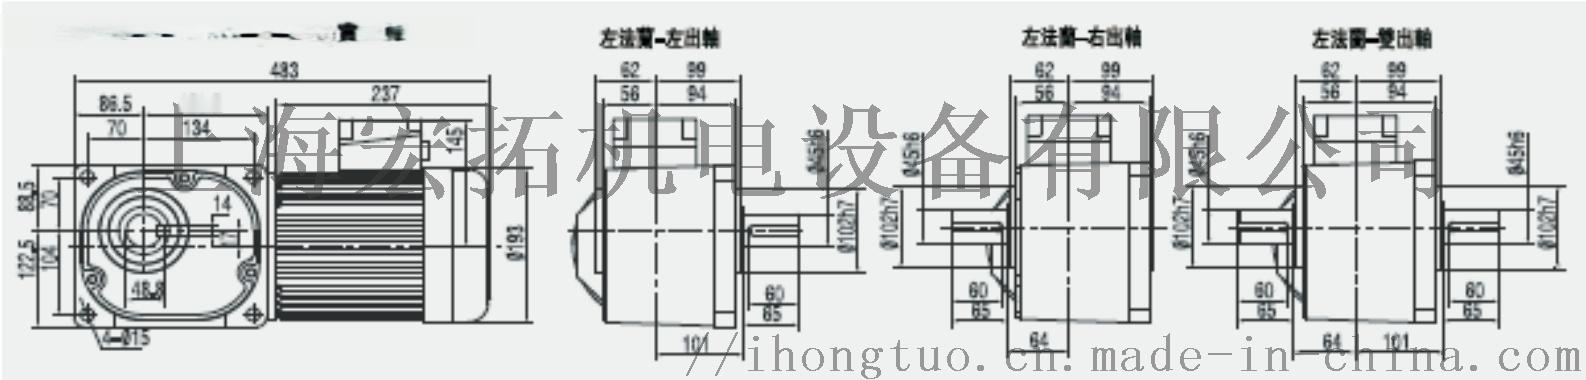 SGF45-S-1.1KW-(5-240)實心軸.png